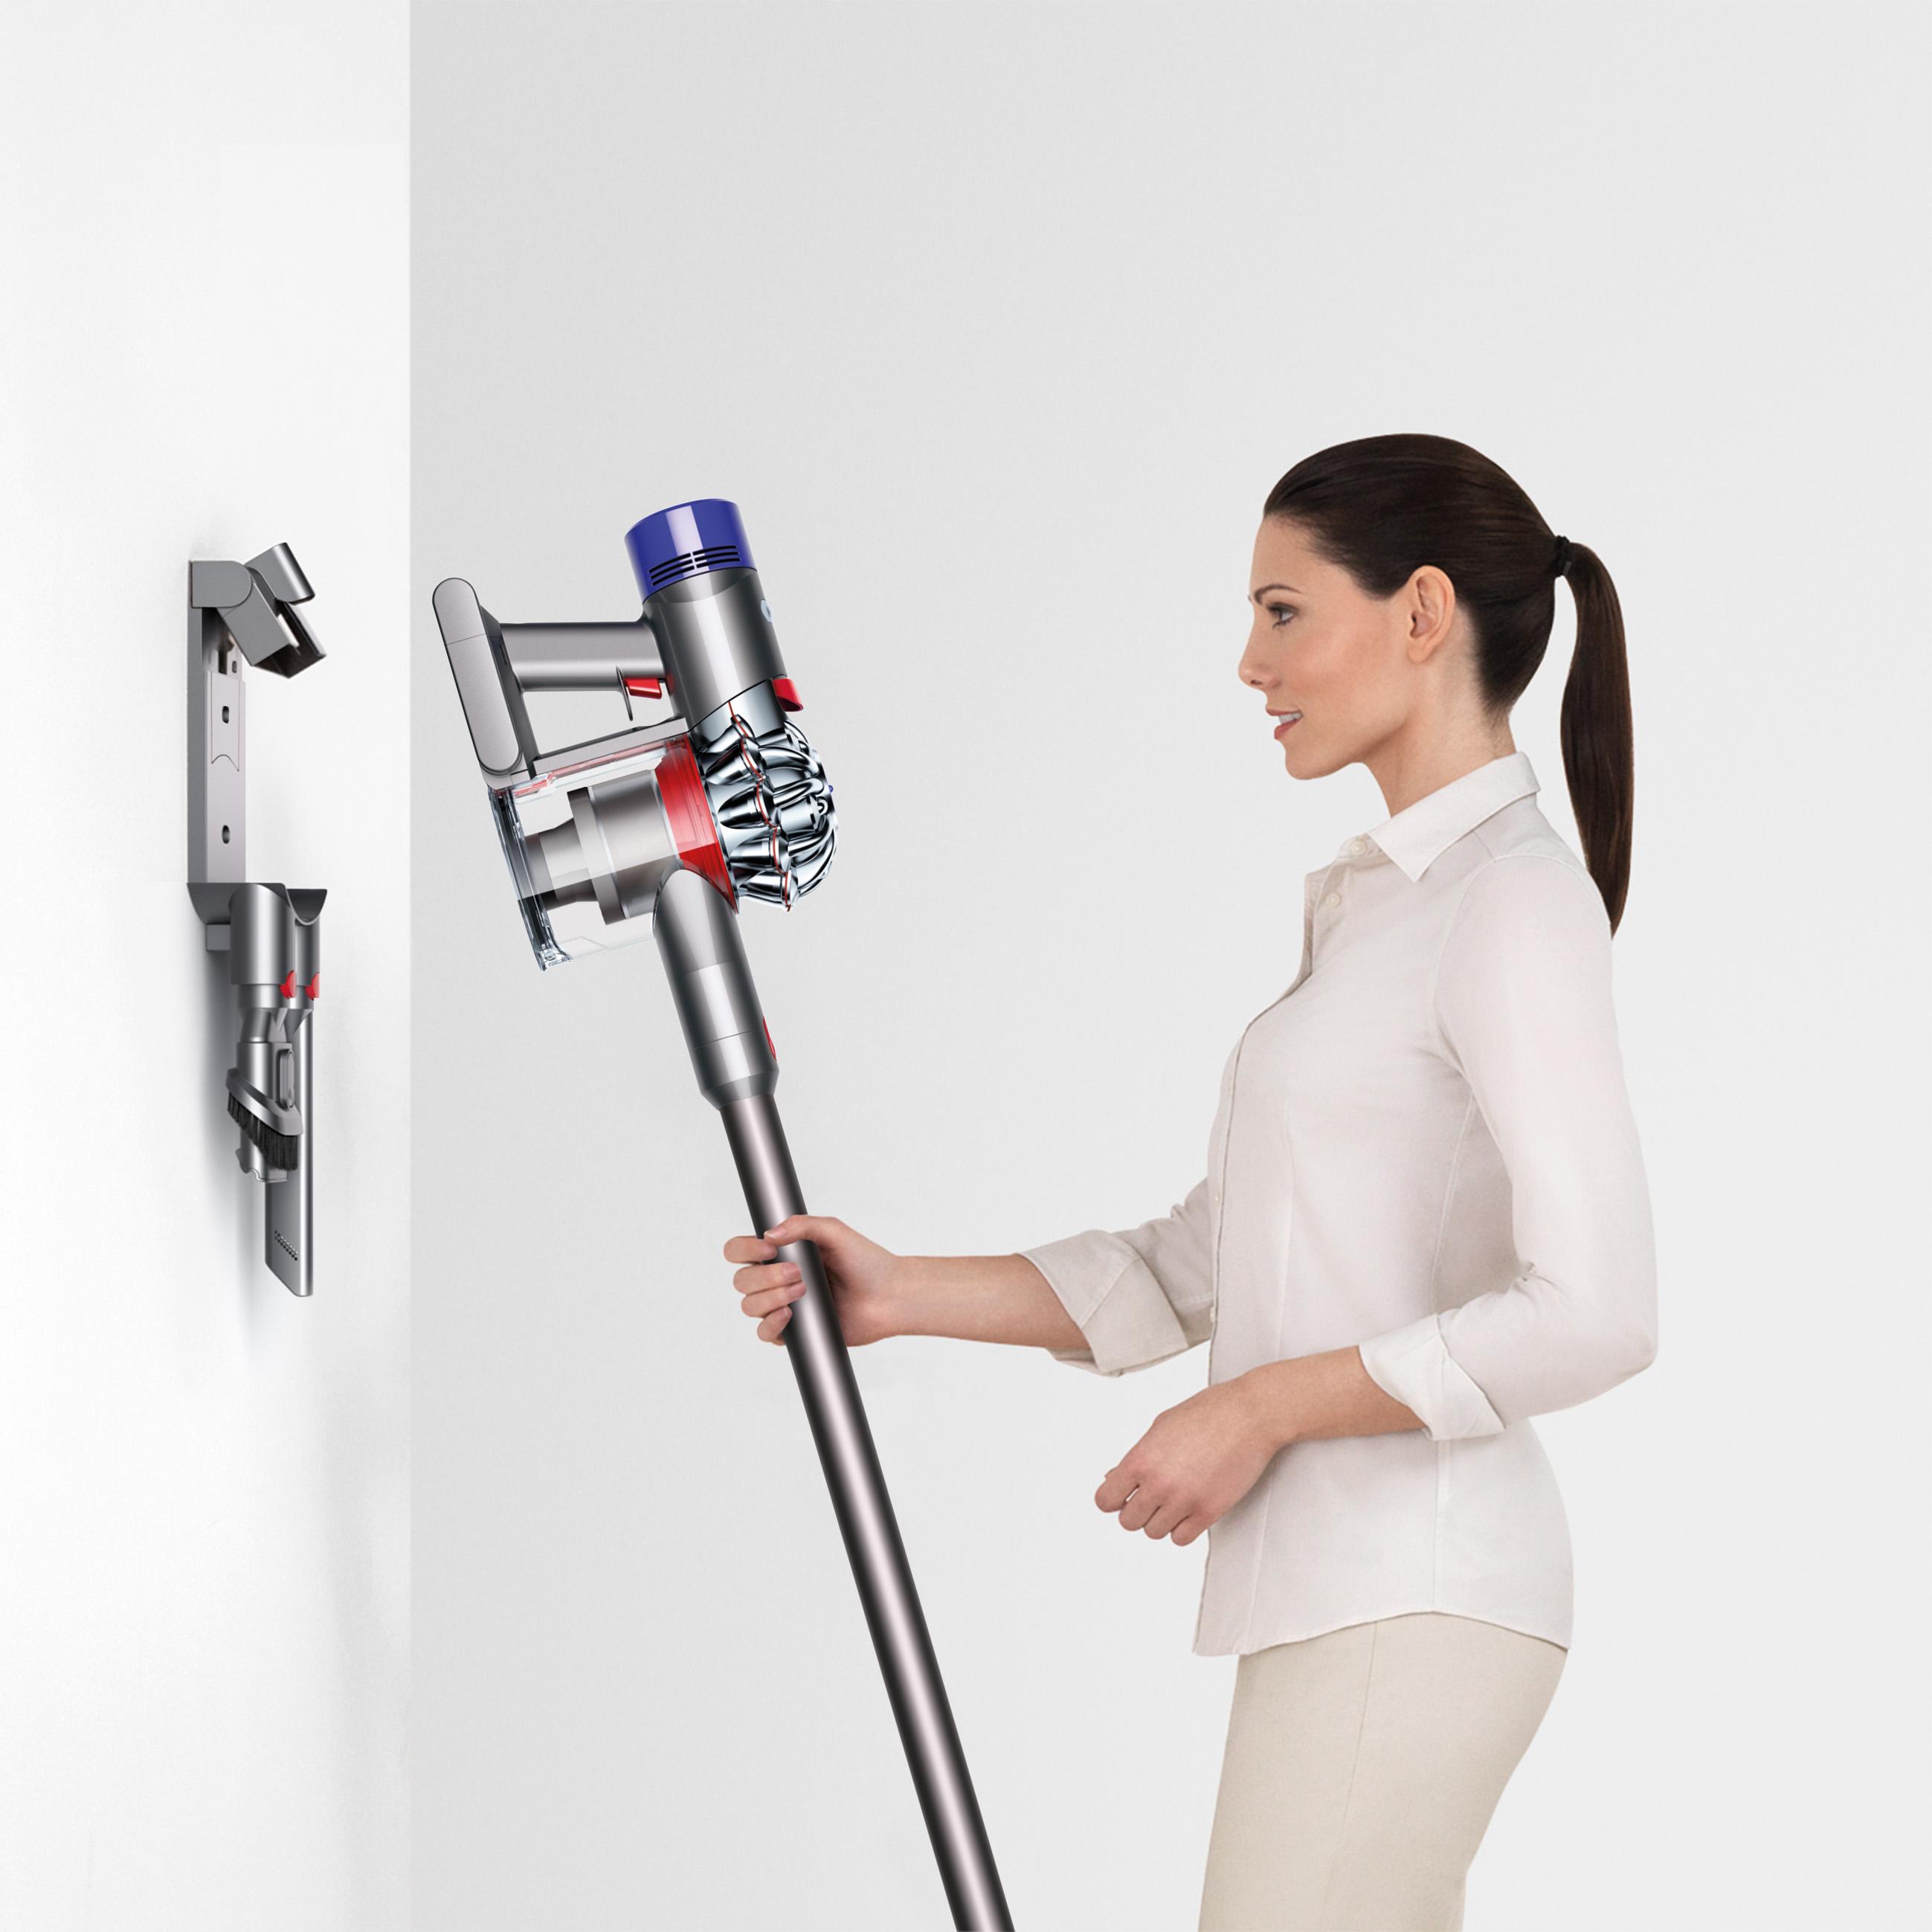 Dyson-V7-Animal-Cordless-HEPA-Vacuum-with-Bonus-Tools-New thumbnail 19